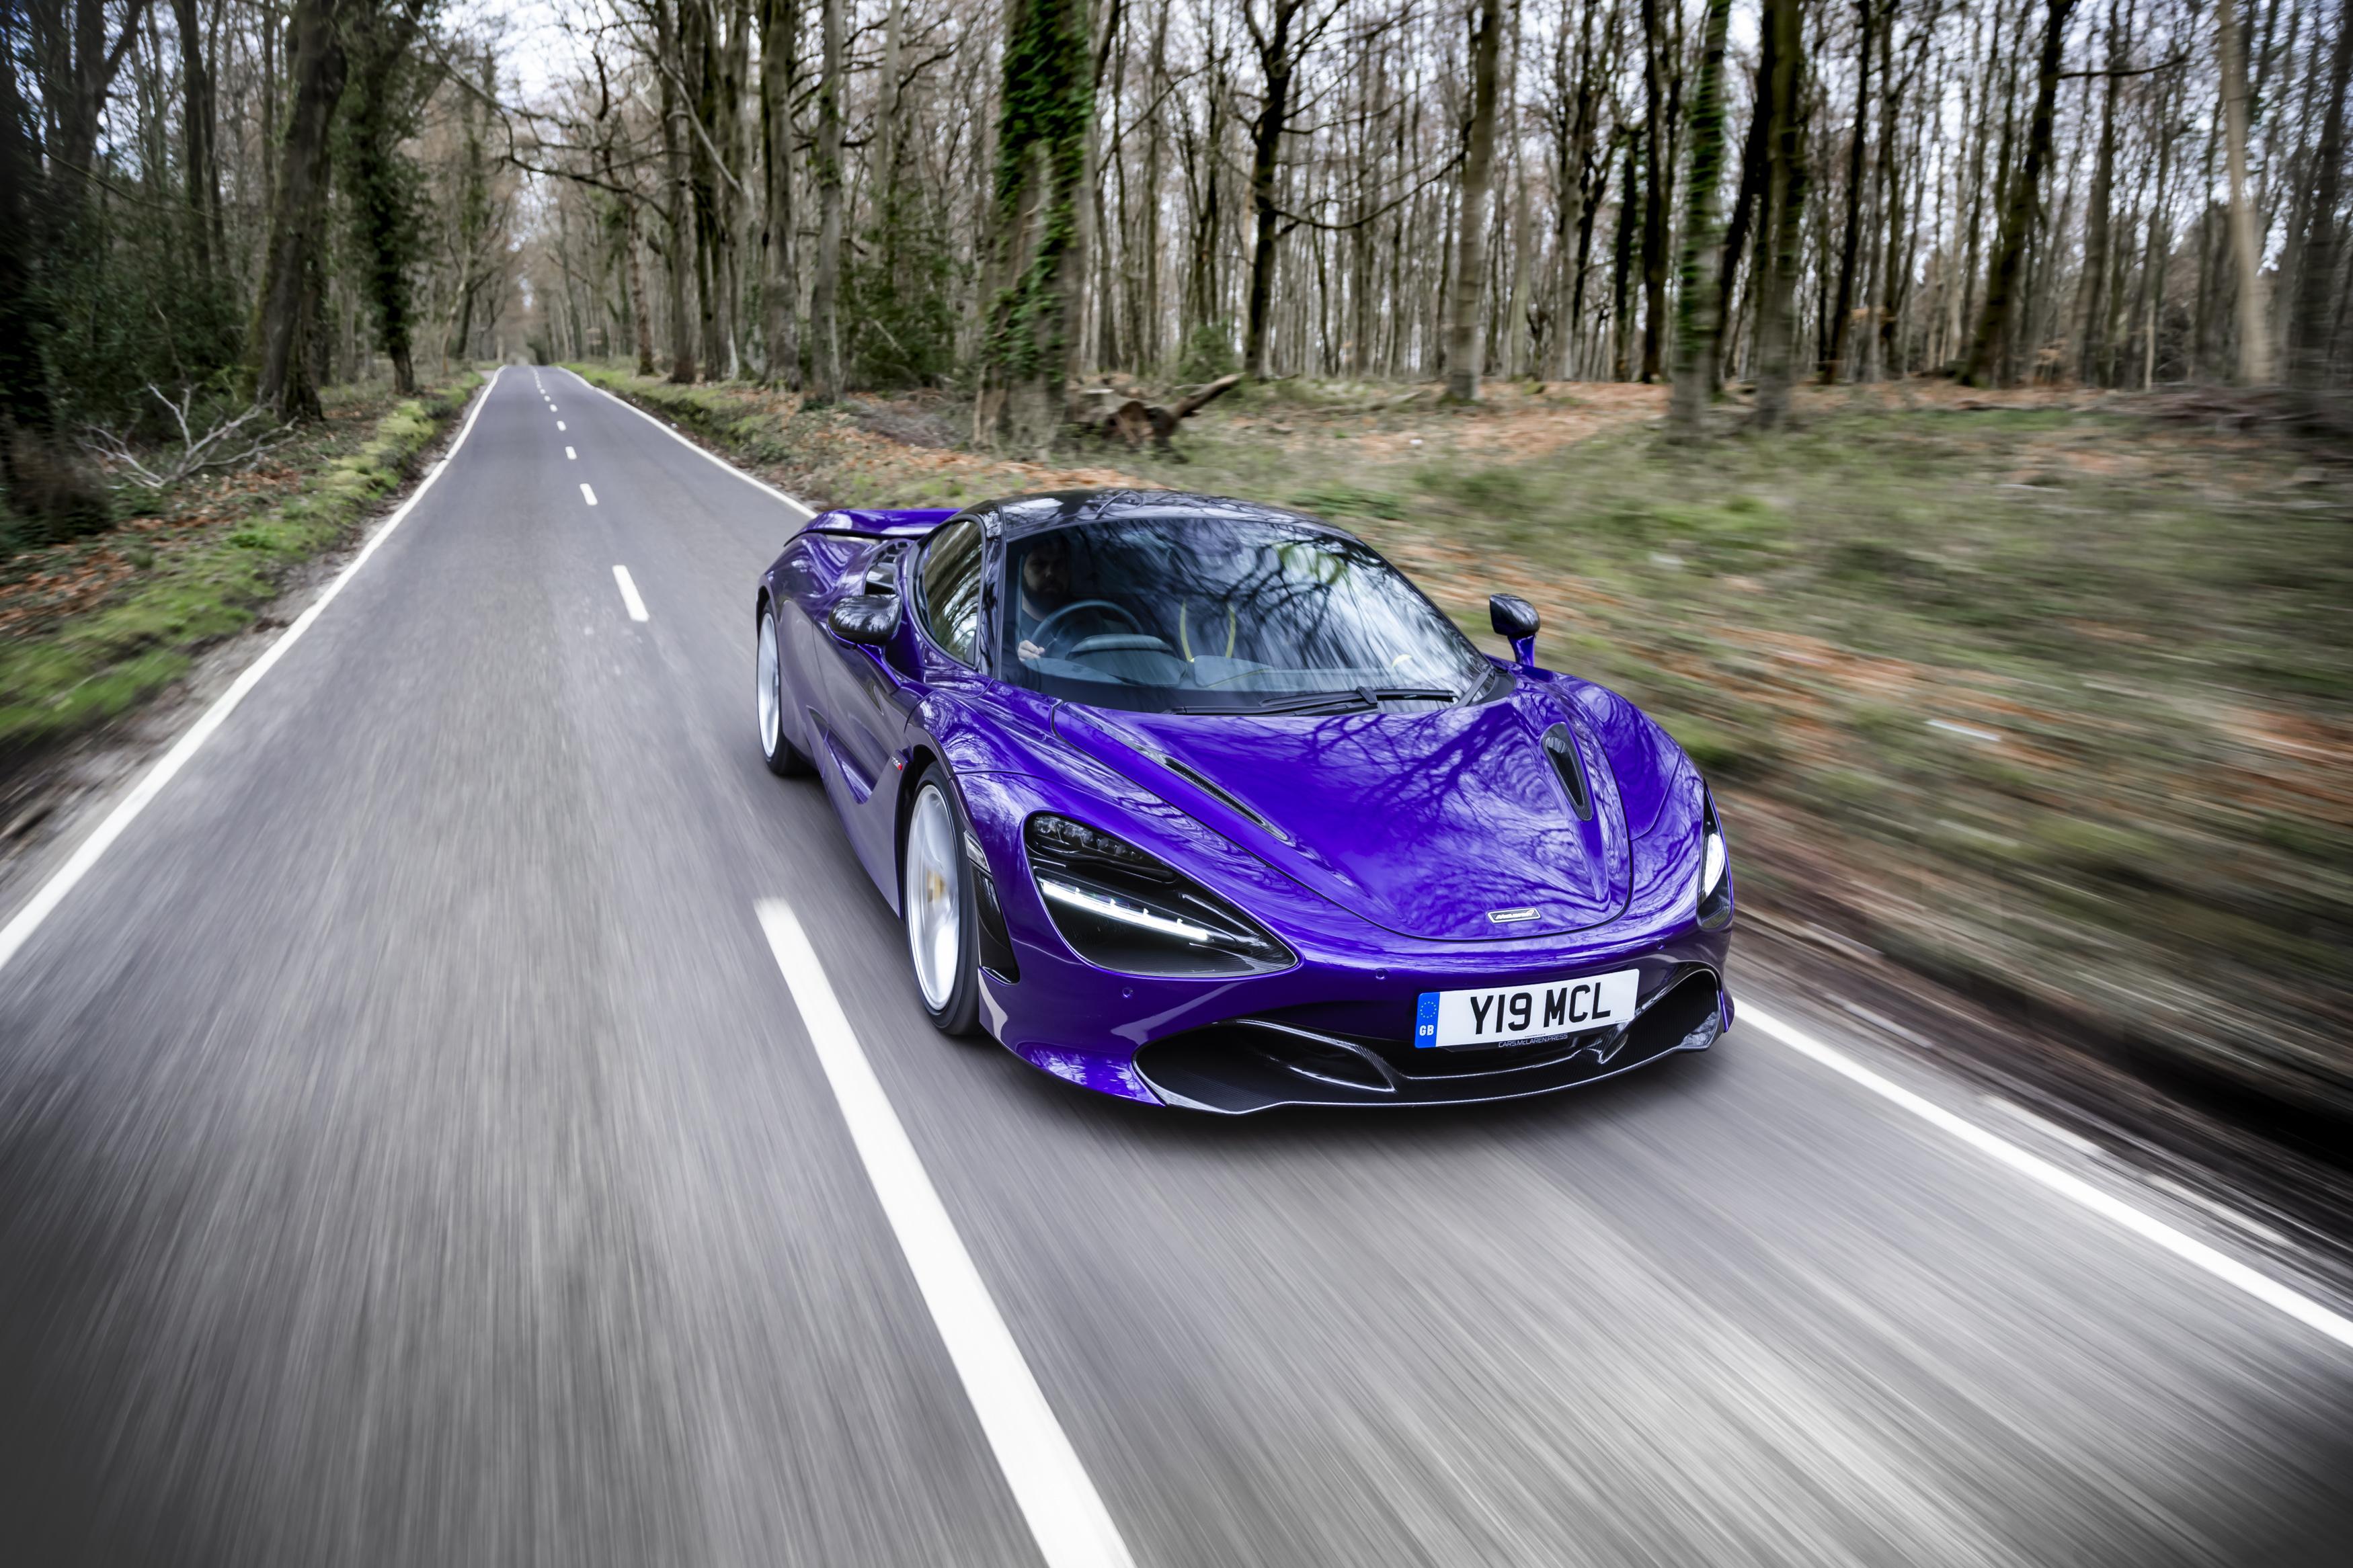 mclaren automotive confirms new forest as latest uk retail location